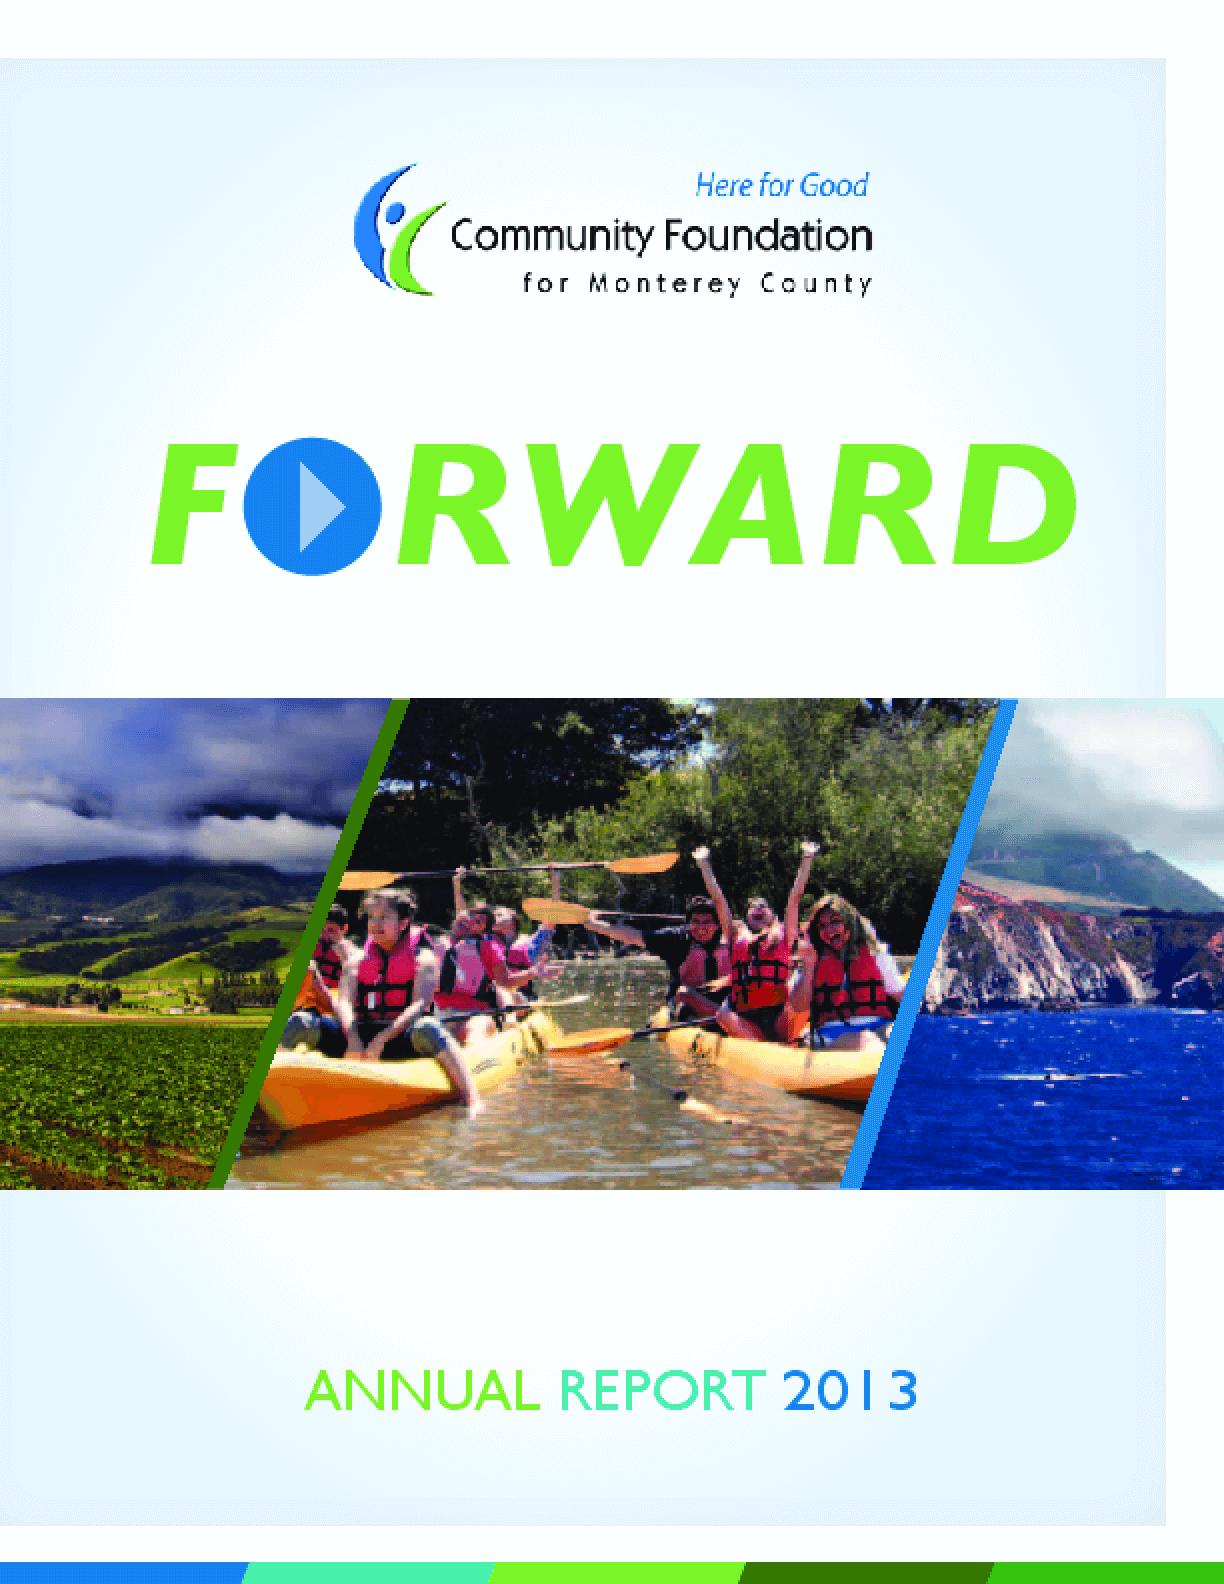 Forward Annual Report 2013